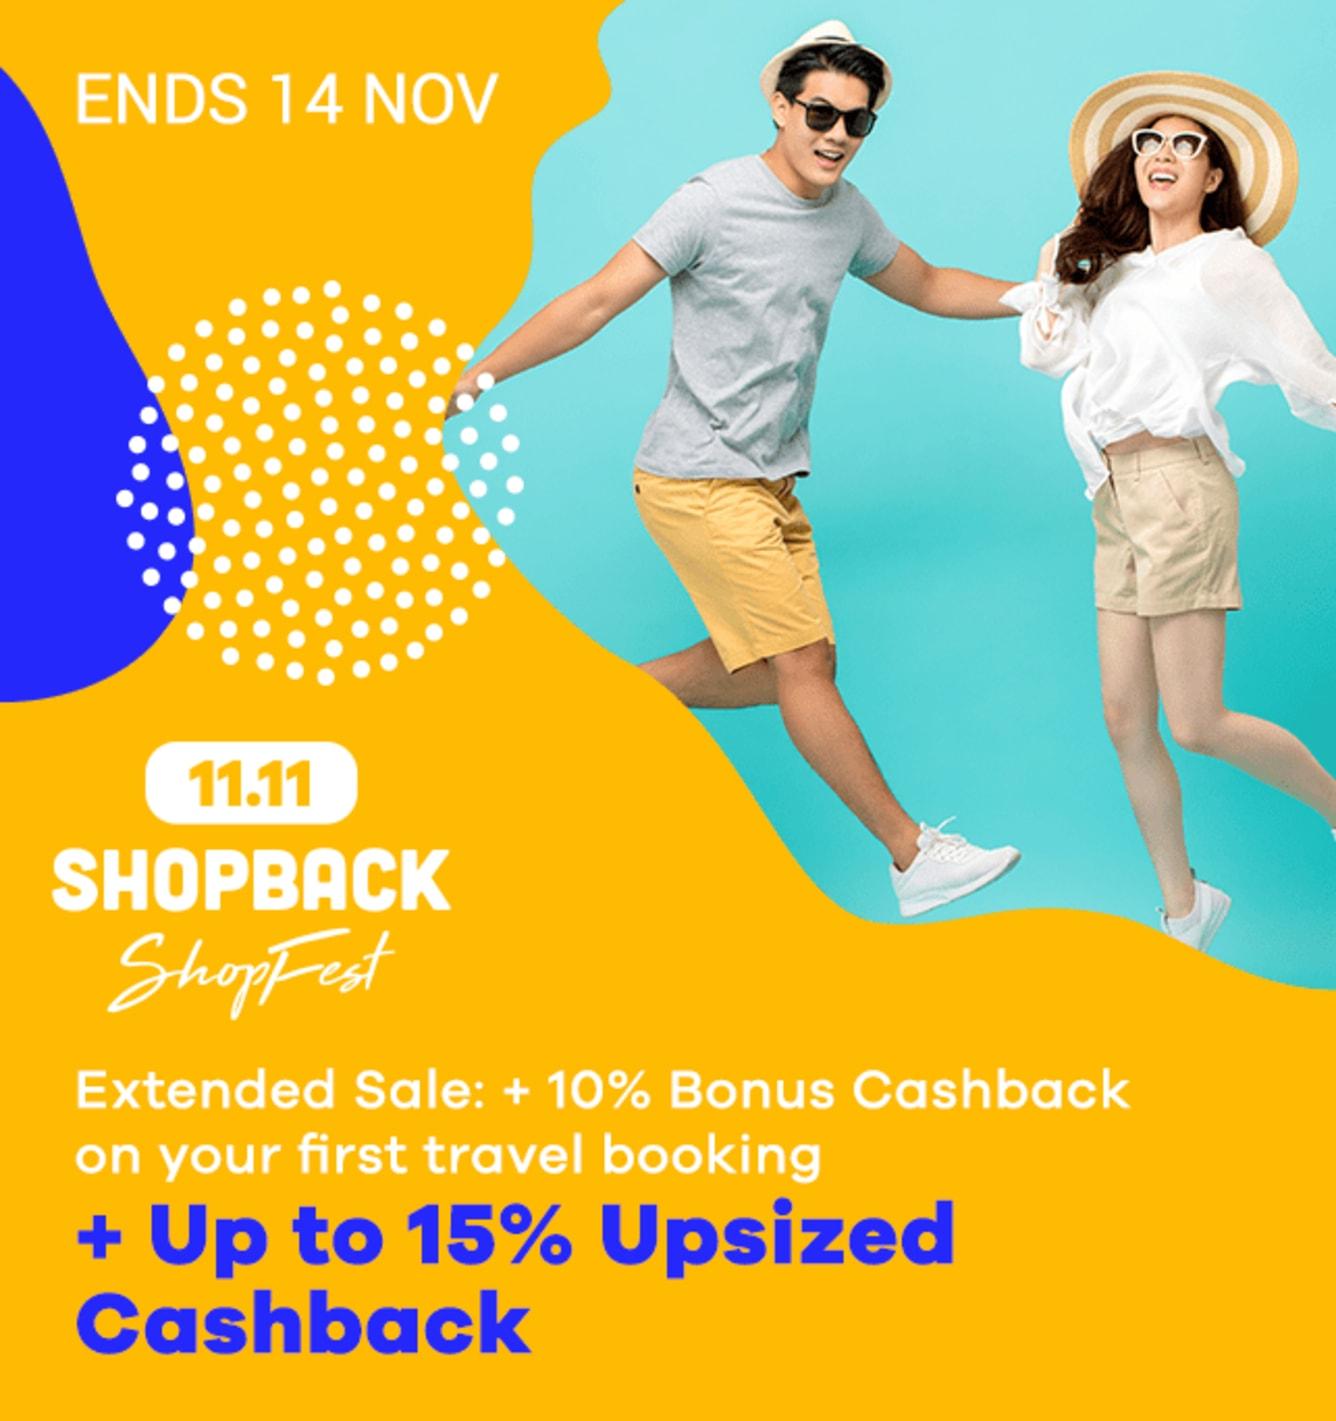 11.11 Shopback ShopFest 2019